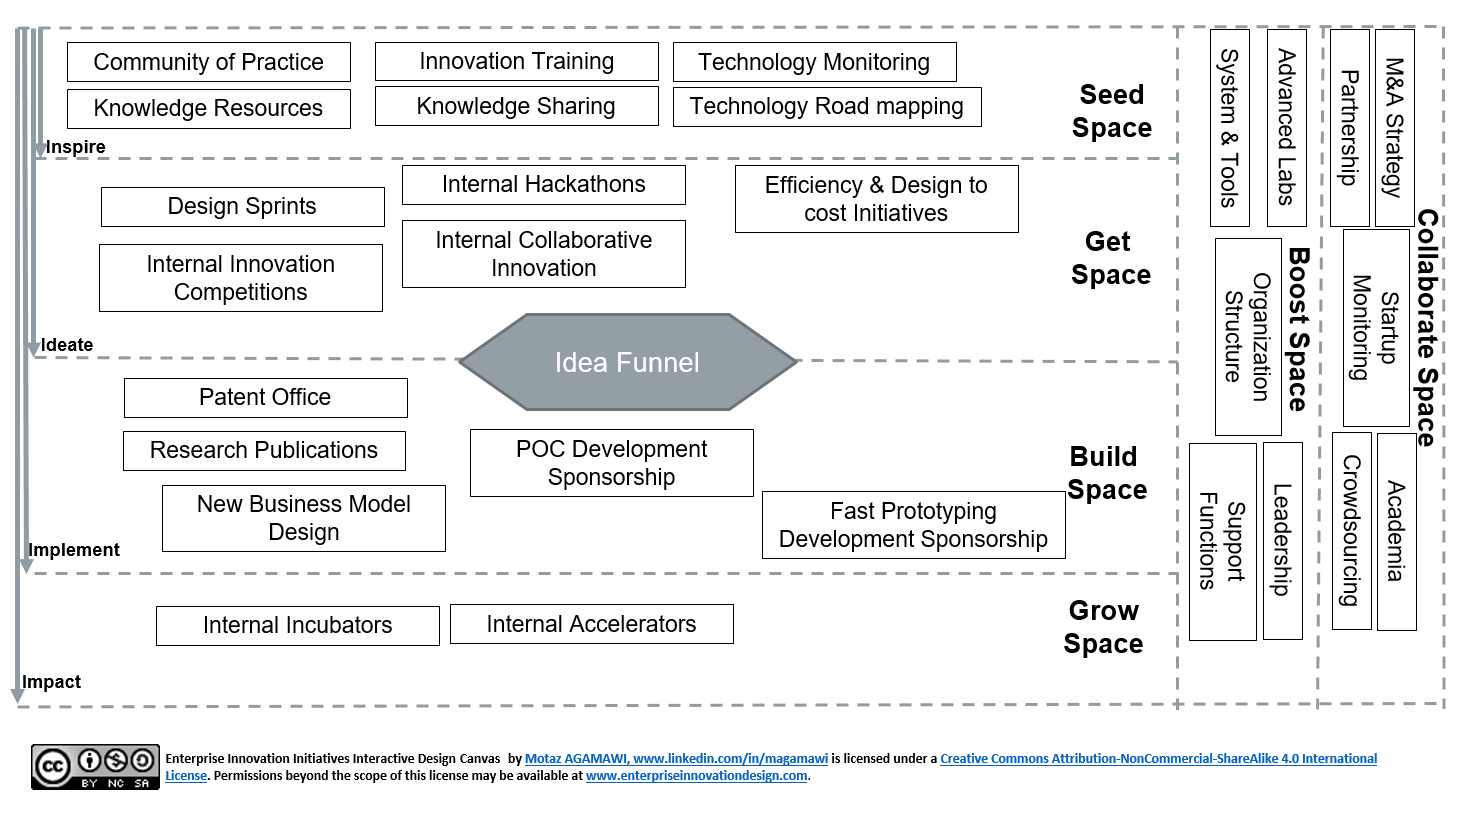 Enterprise Innovation Initiatives Interactive Design Canvas